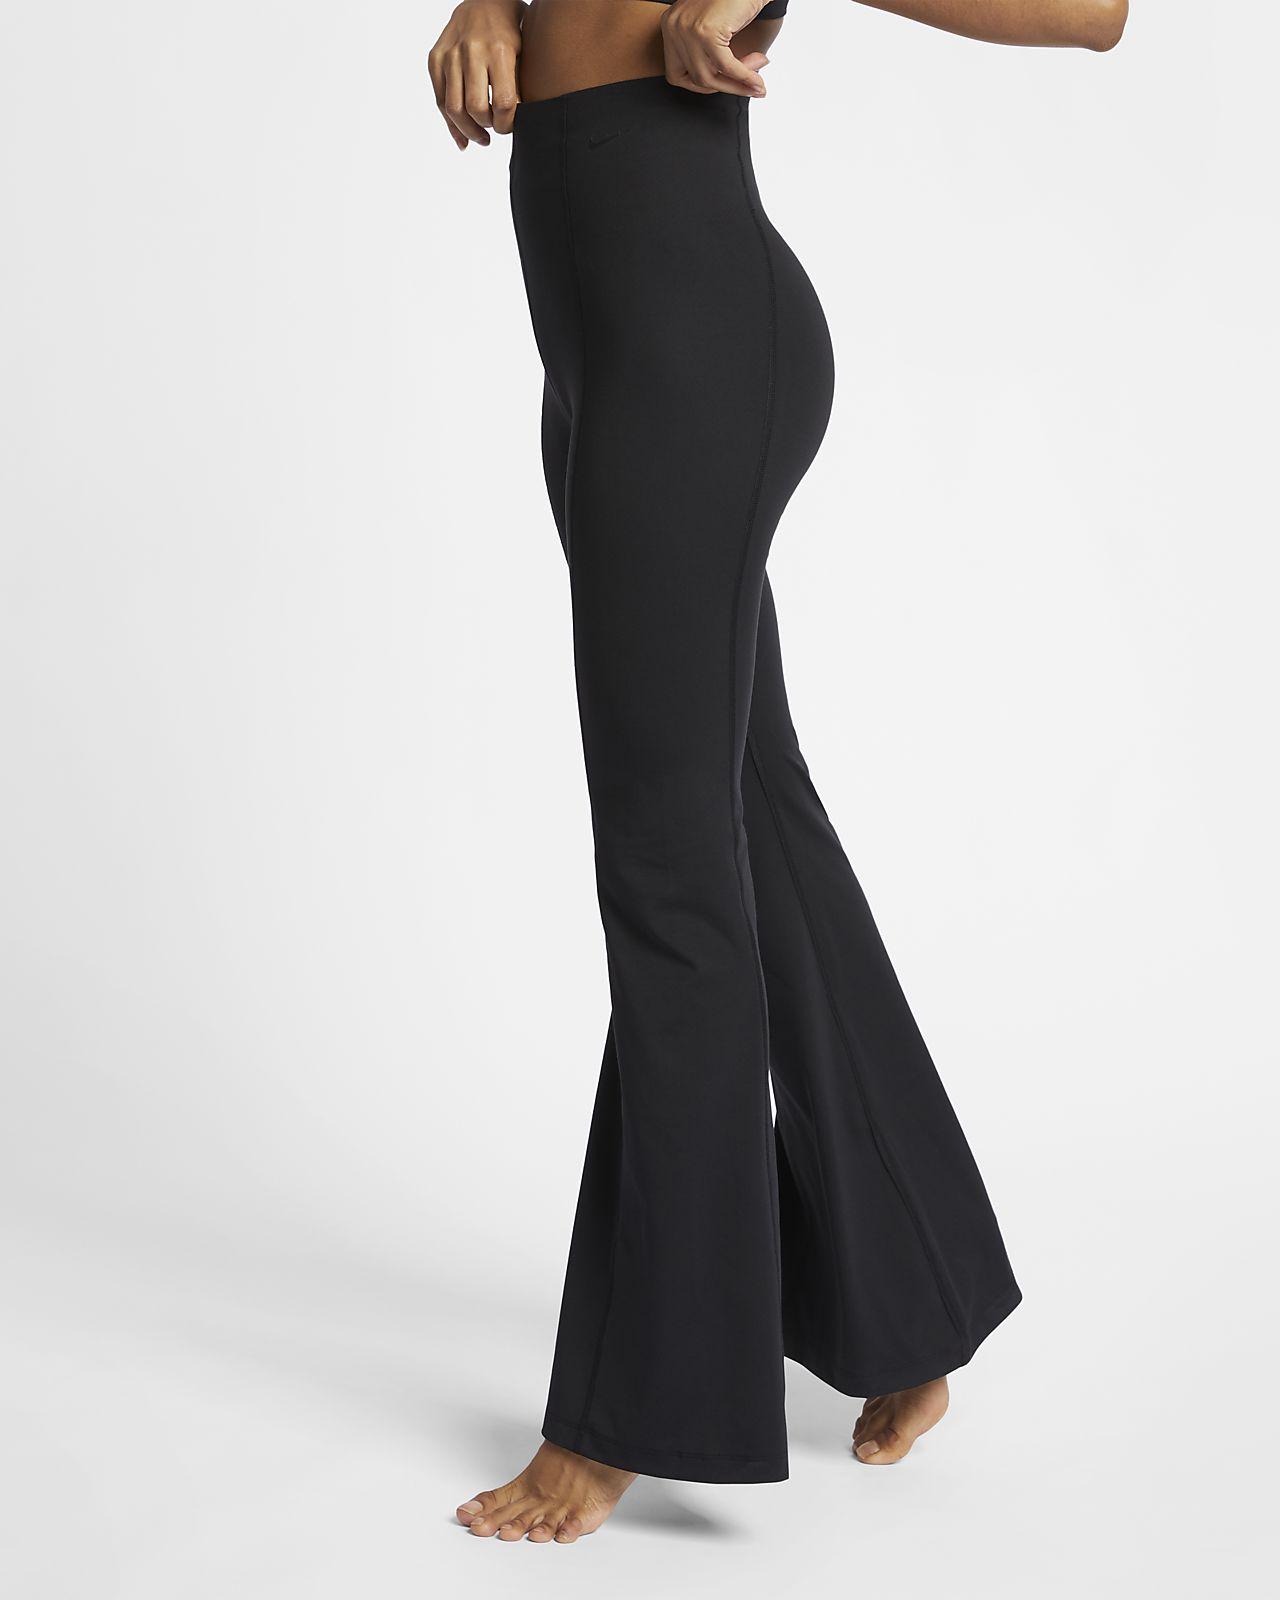 Nike Power Studio Lux Women's Yoga Tights